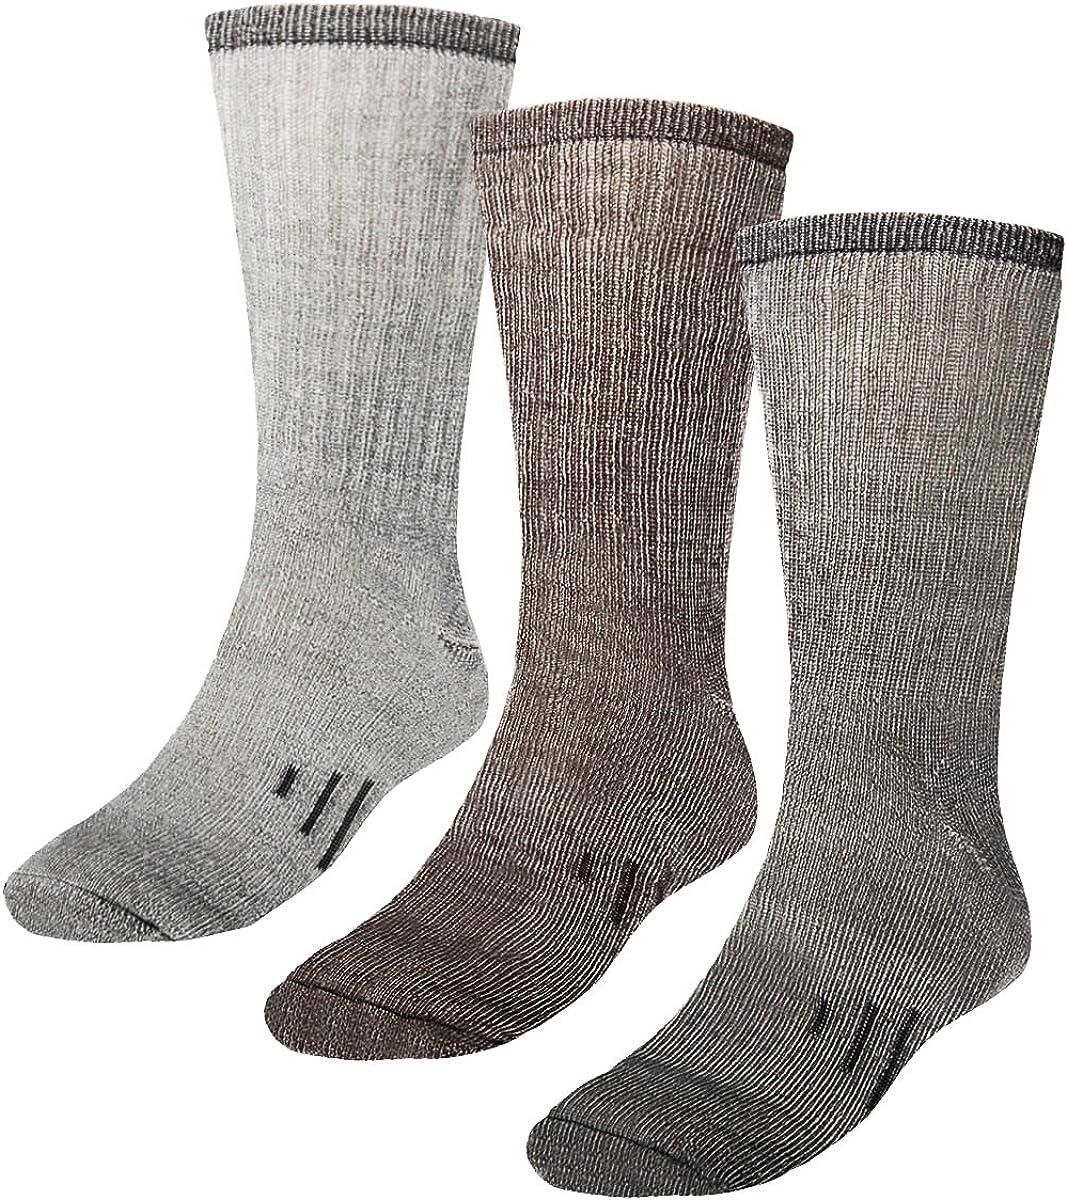 3 Pairs 80% Merino Wool Thermal Crew Mens Wool Socks For Winter, Mens and Womens Hiking Socks